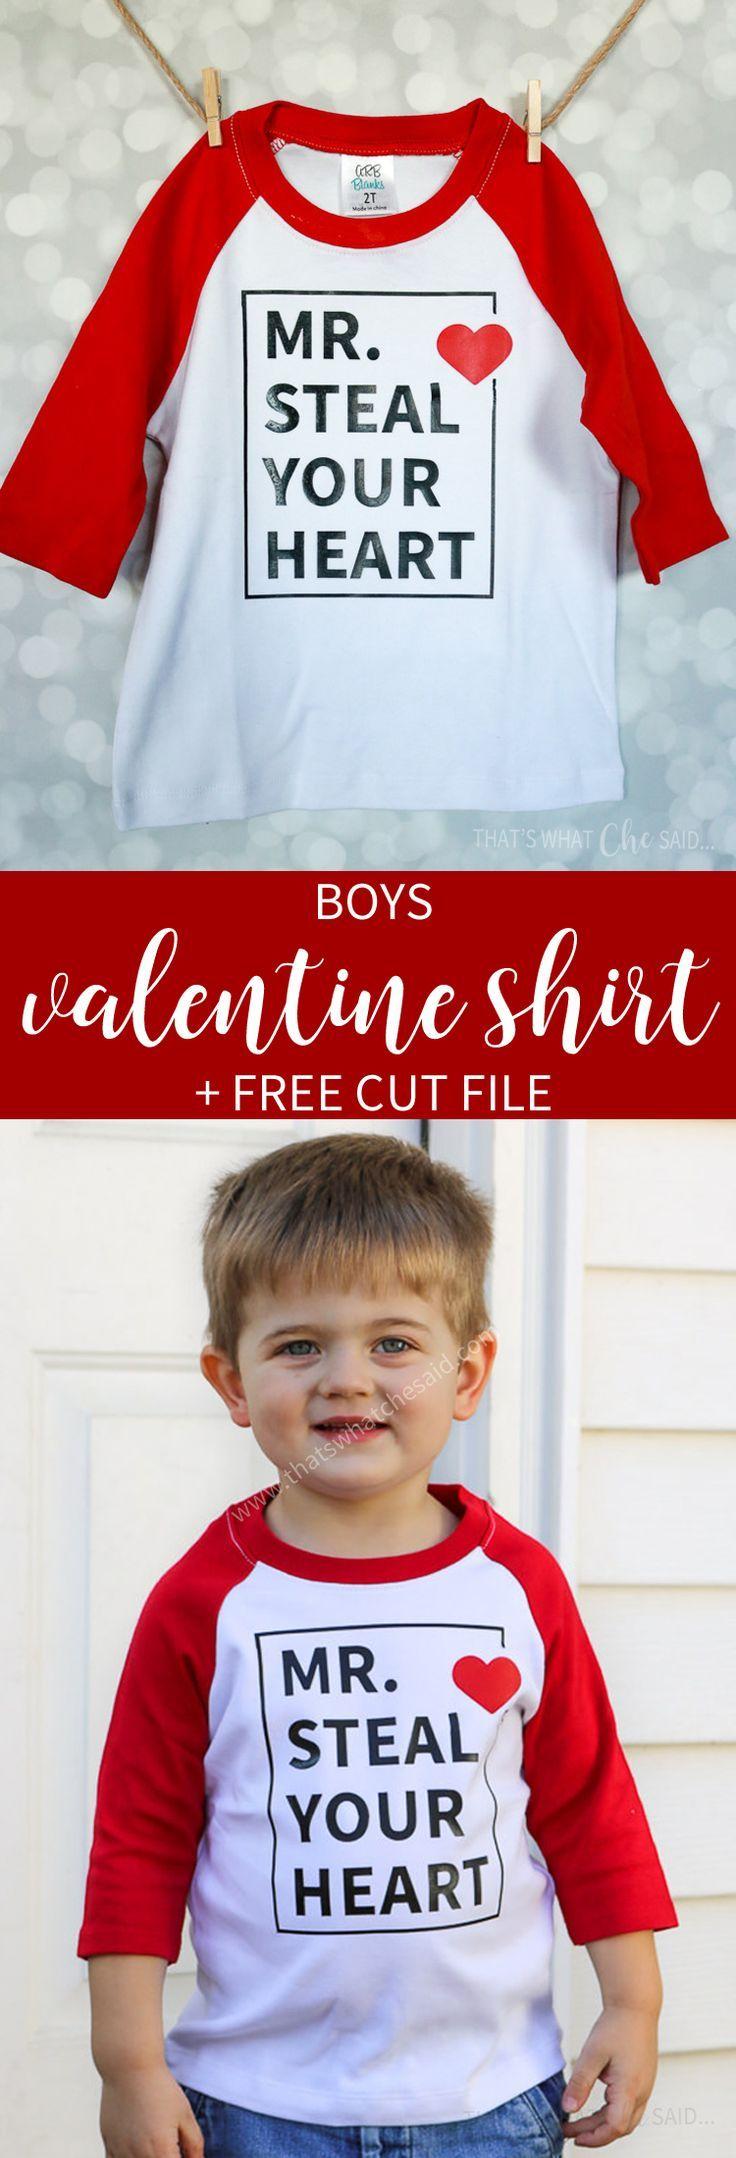 Boys Valentine Shirt Design Free Cut File A Fun And